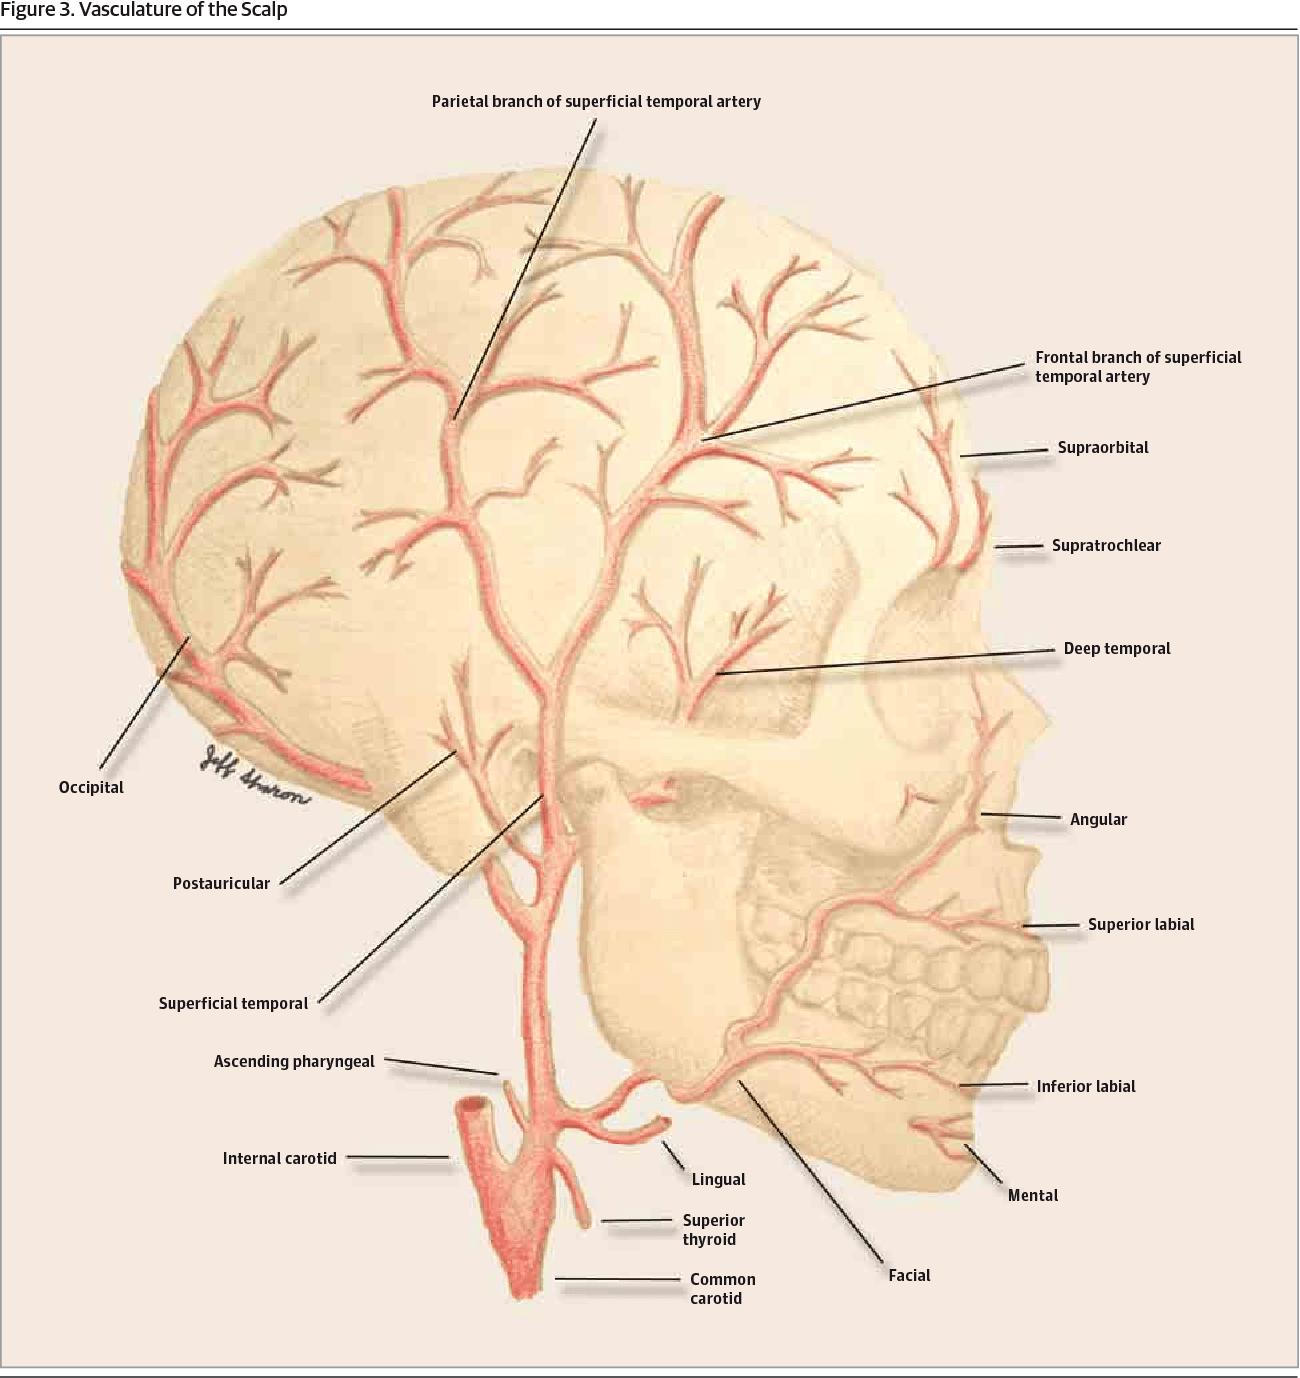 hight resolution of vasculature of the scalp